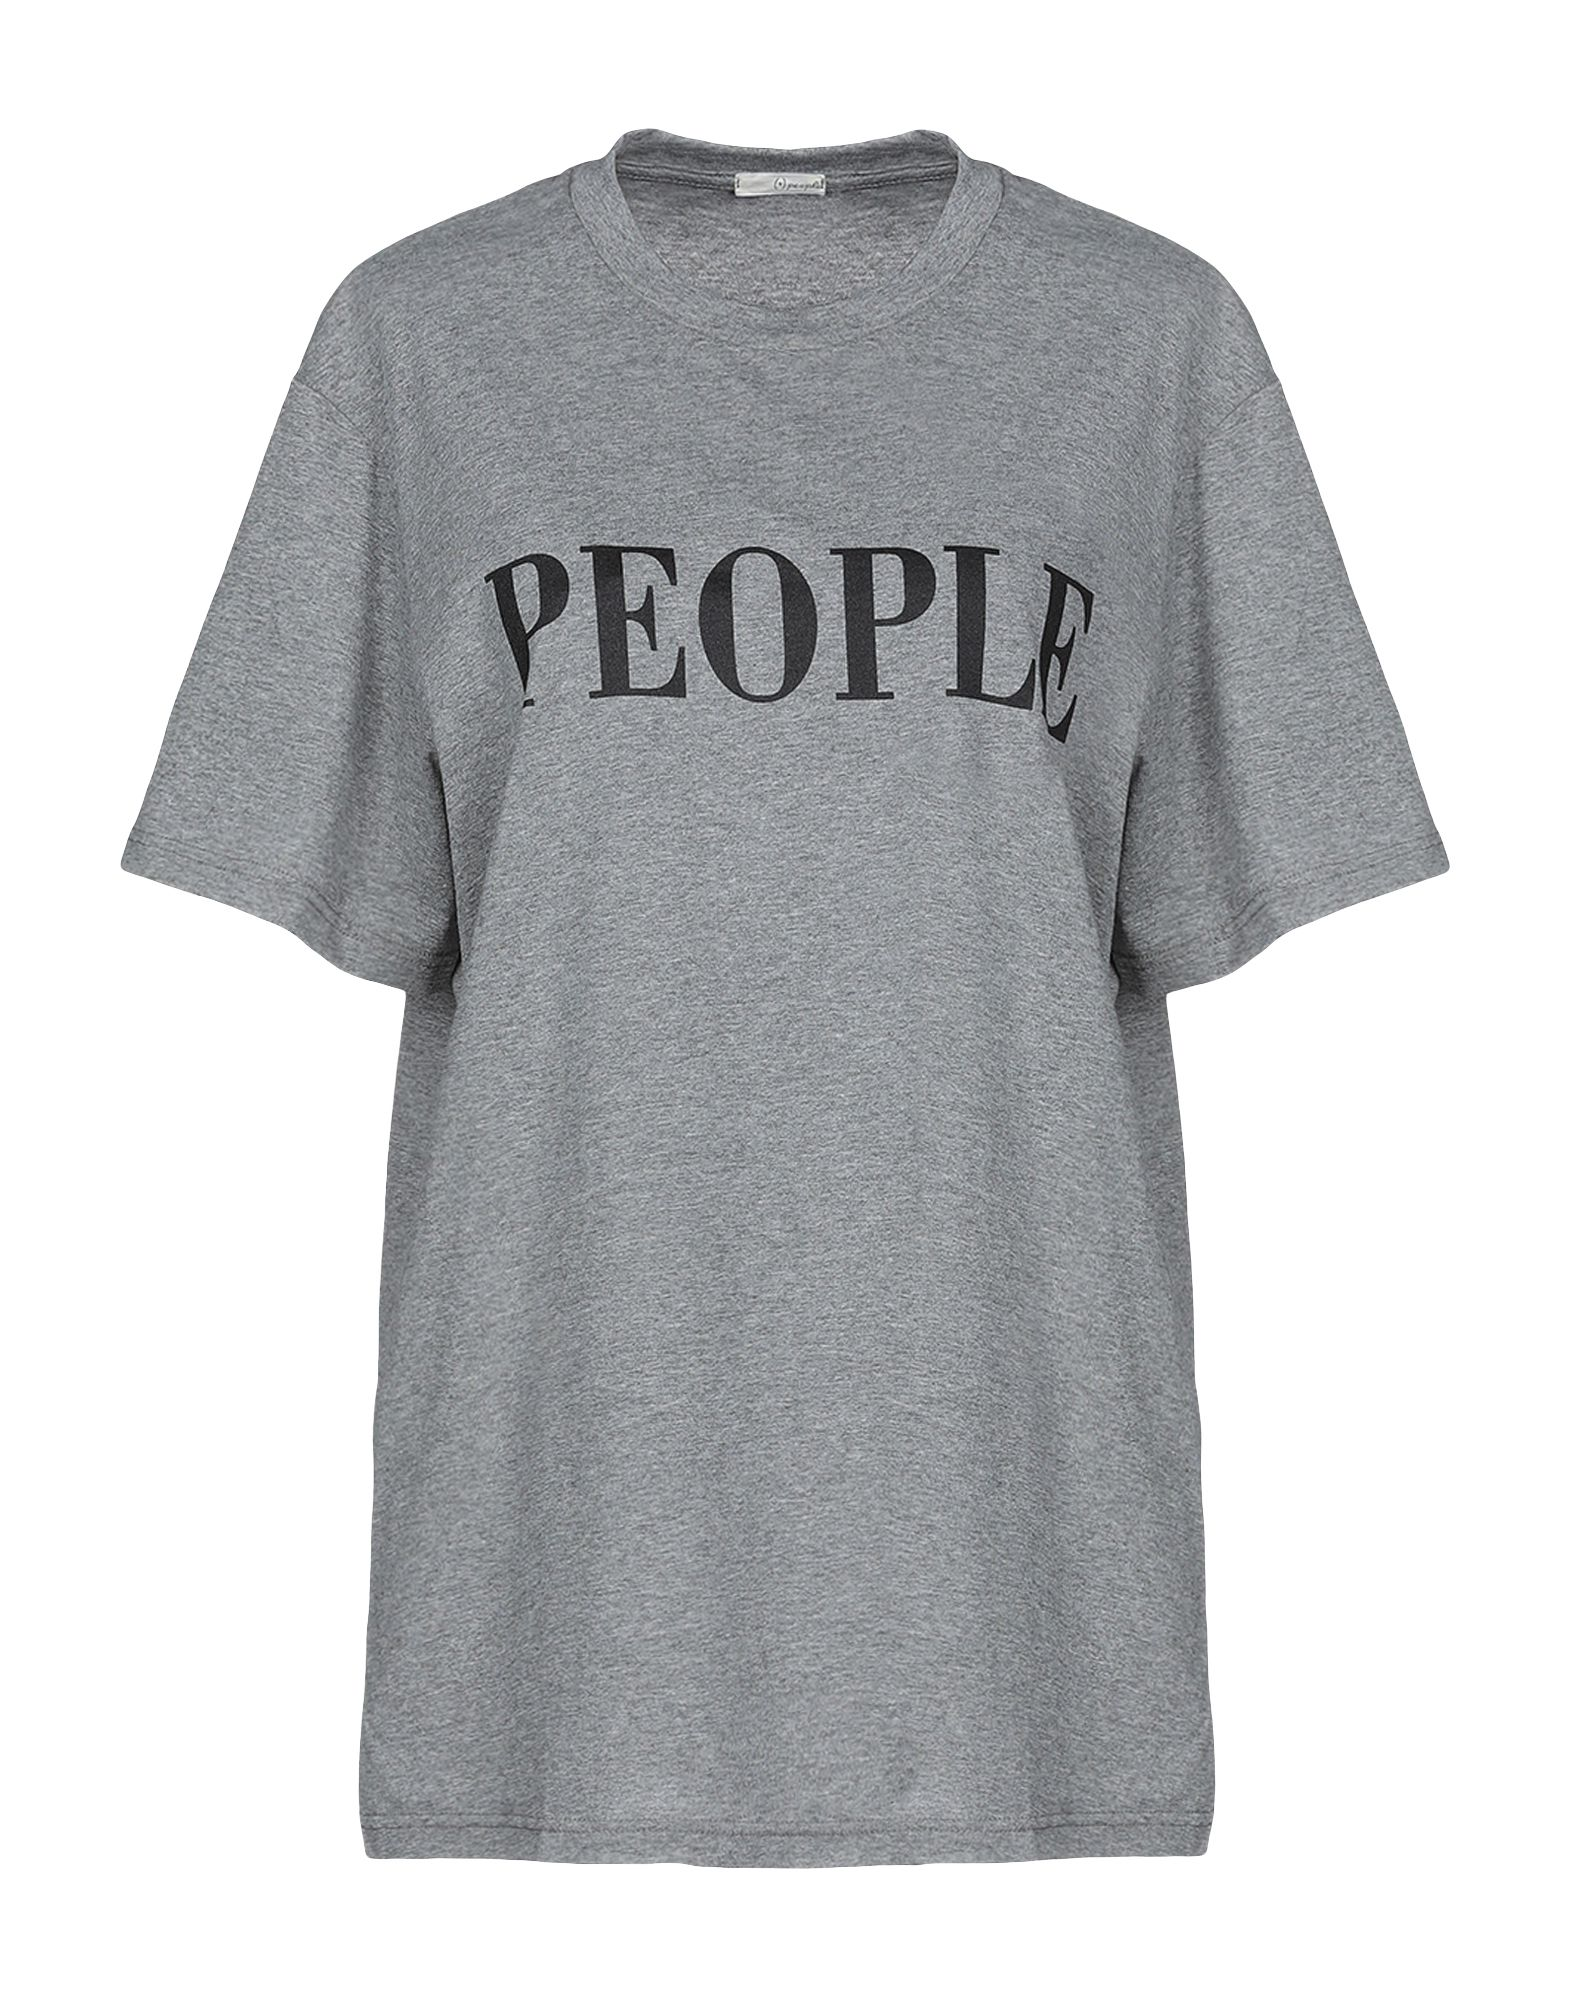 (+) PEOPLE Футболка футболка классическая printio junk people